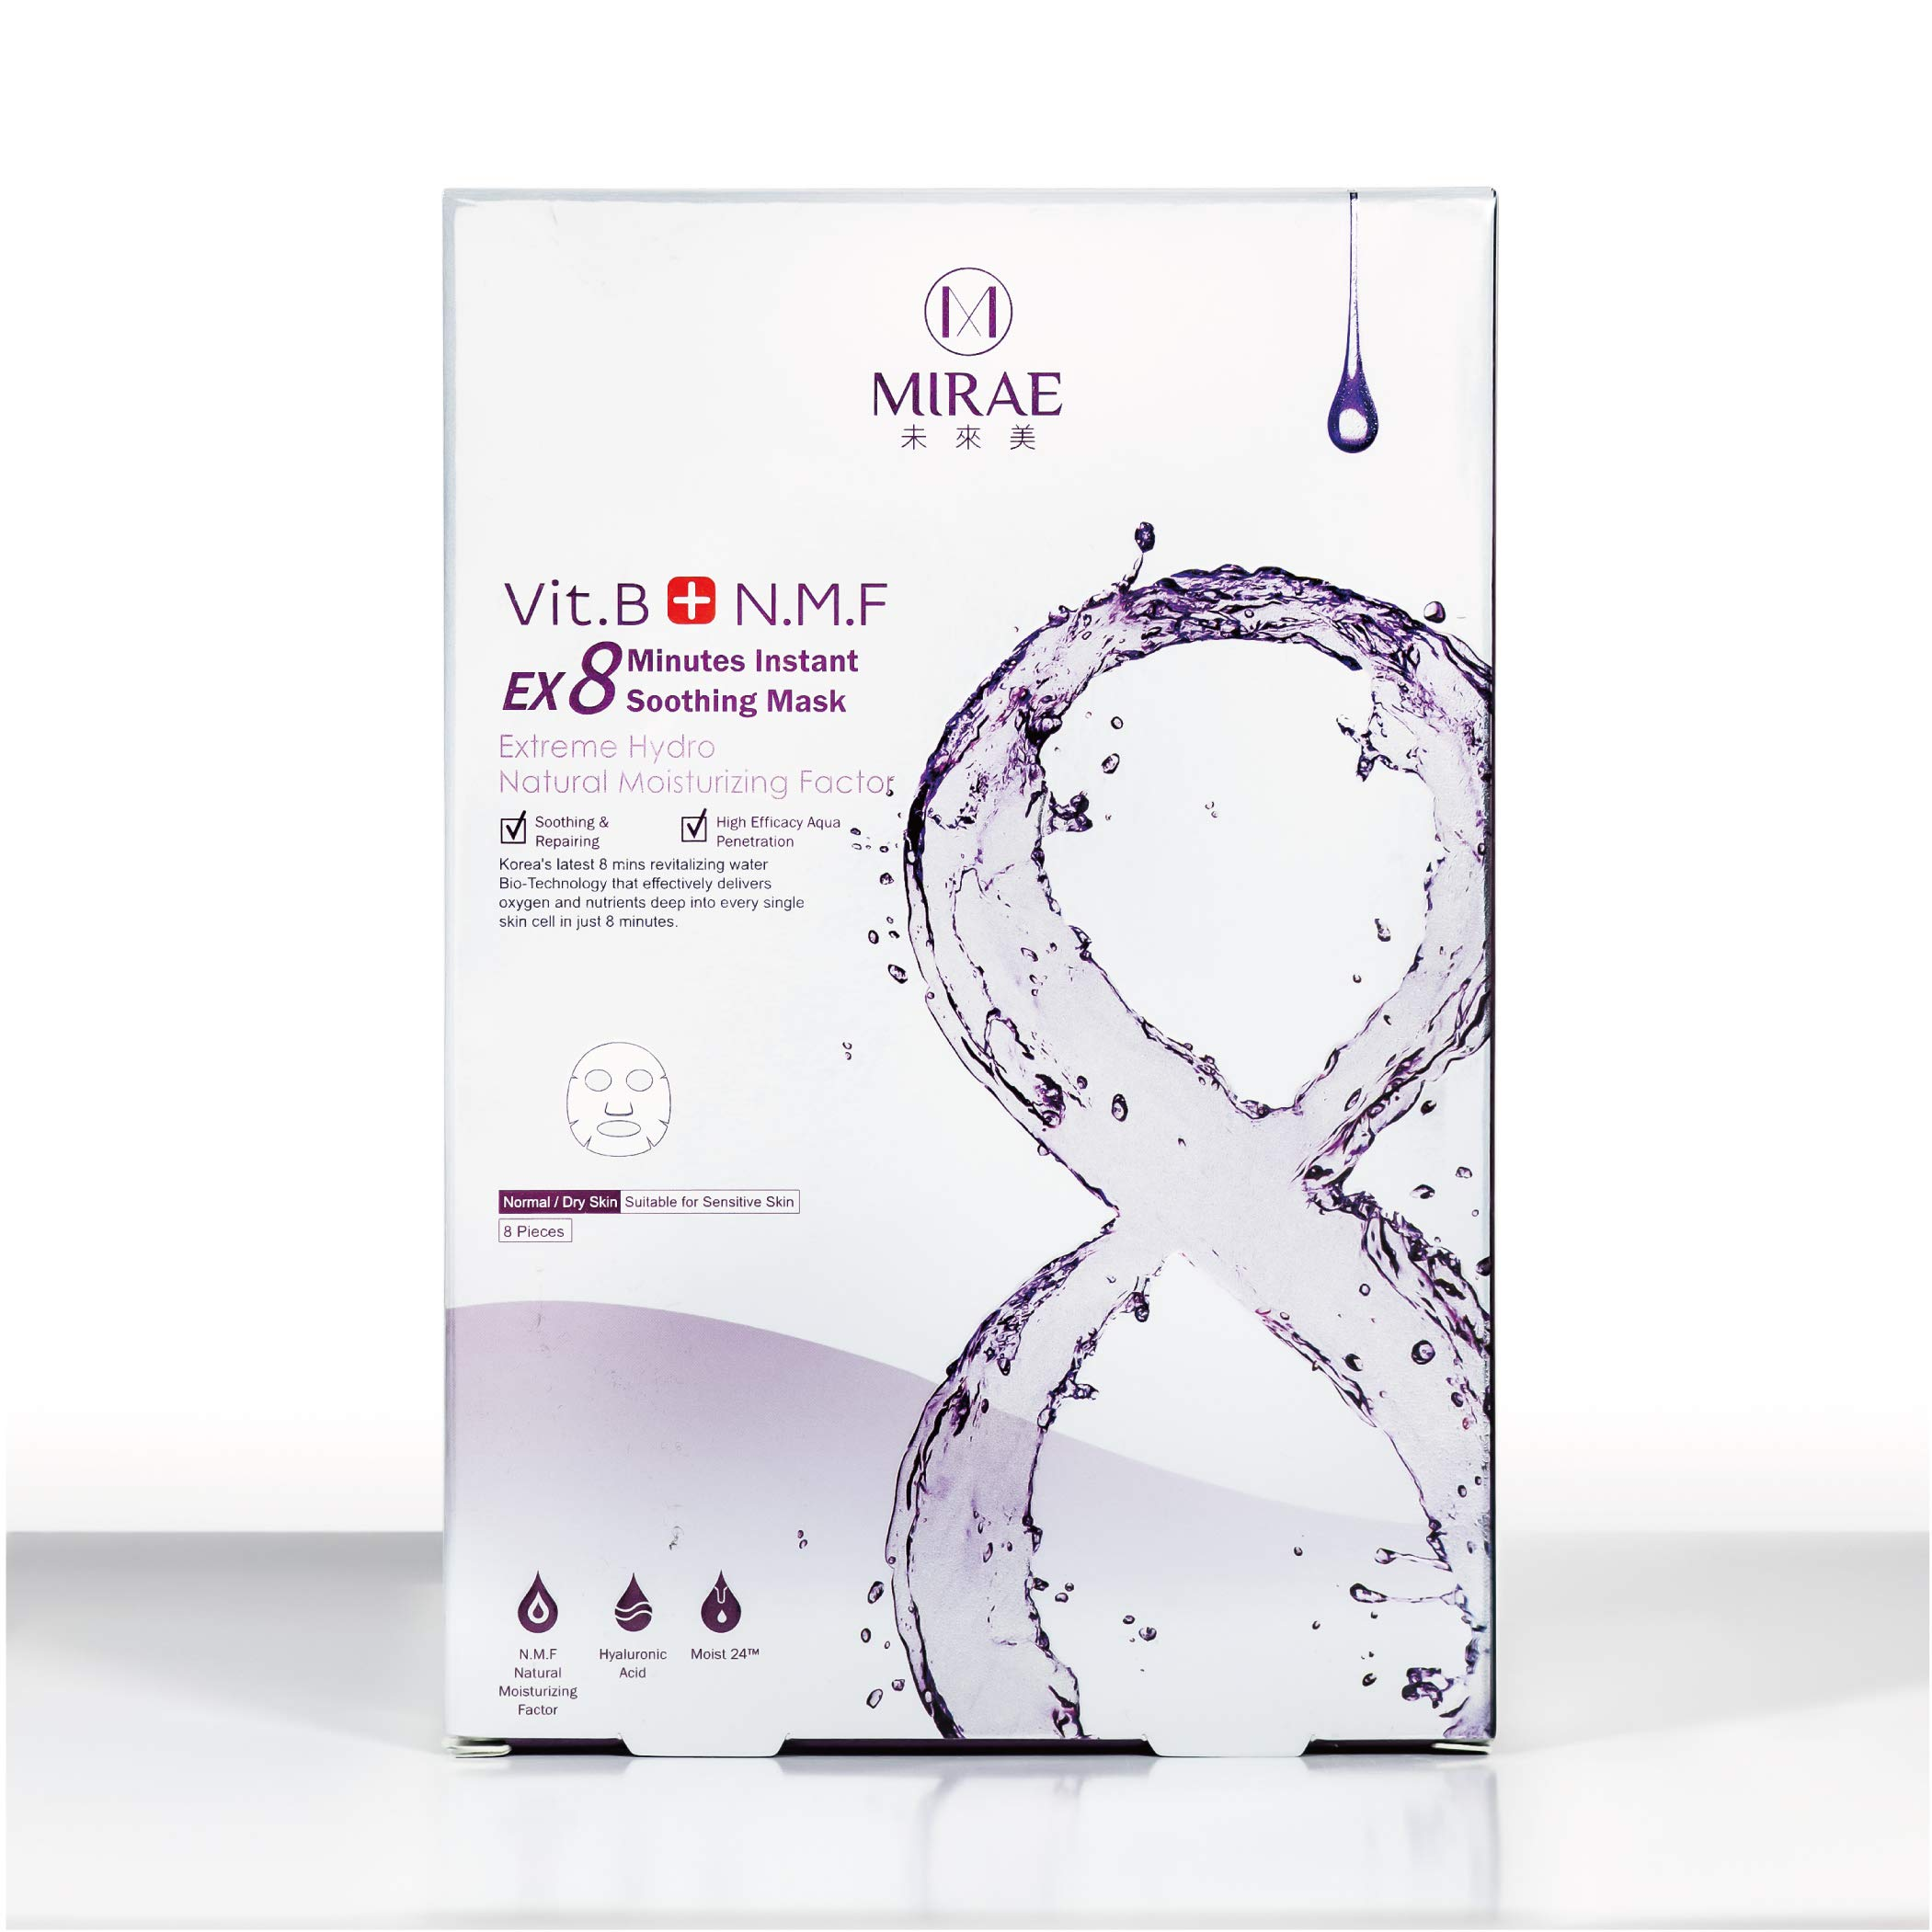 bd259868af79 Amazon.com : MIRAE Beauty 8 Minutes Anti-Aging Facial Sheet Mask ...